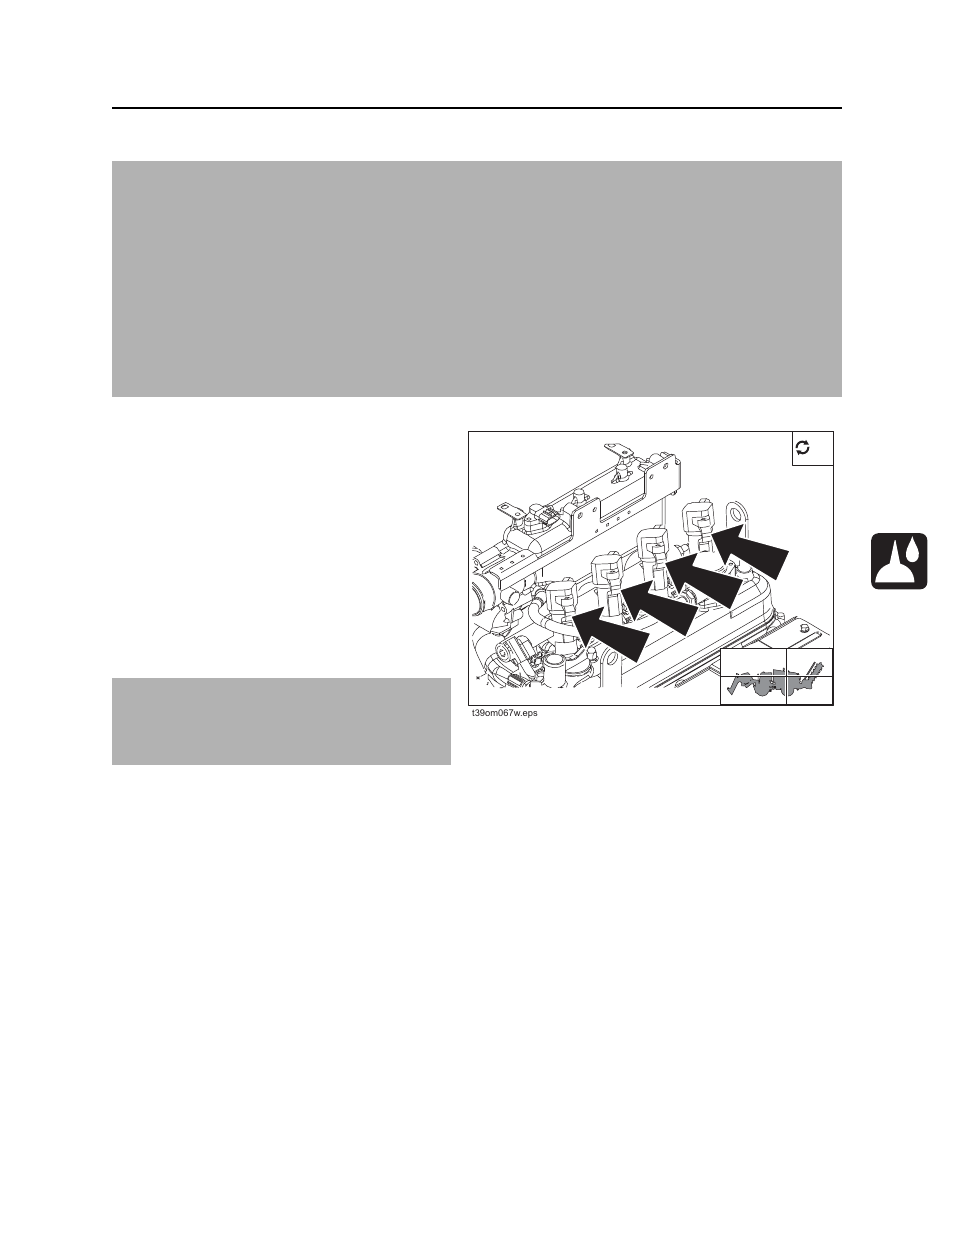 410sx operator s manual ditch witch 410sx user manual page 106 rh manualsdir com Ditch Witch 410 Parts Ditch Witch 4020